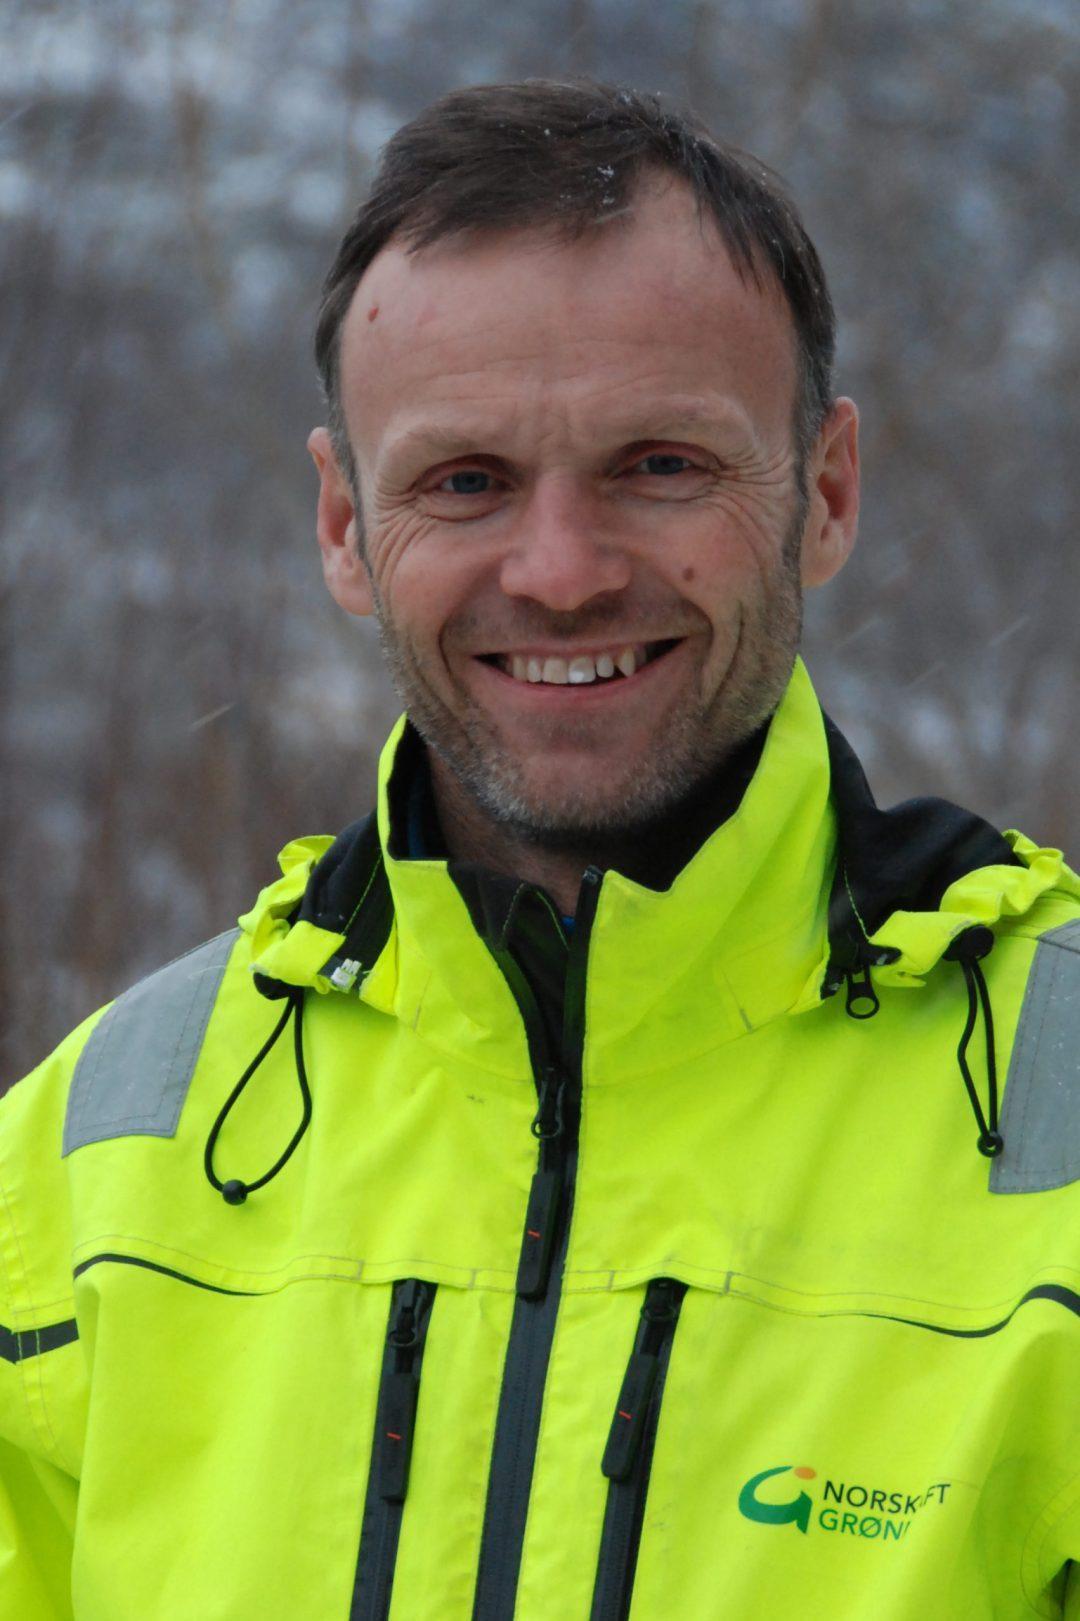 Endre Vik Arset